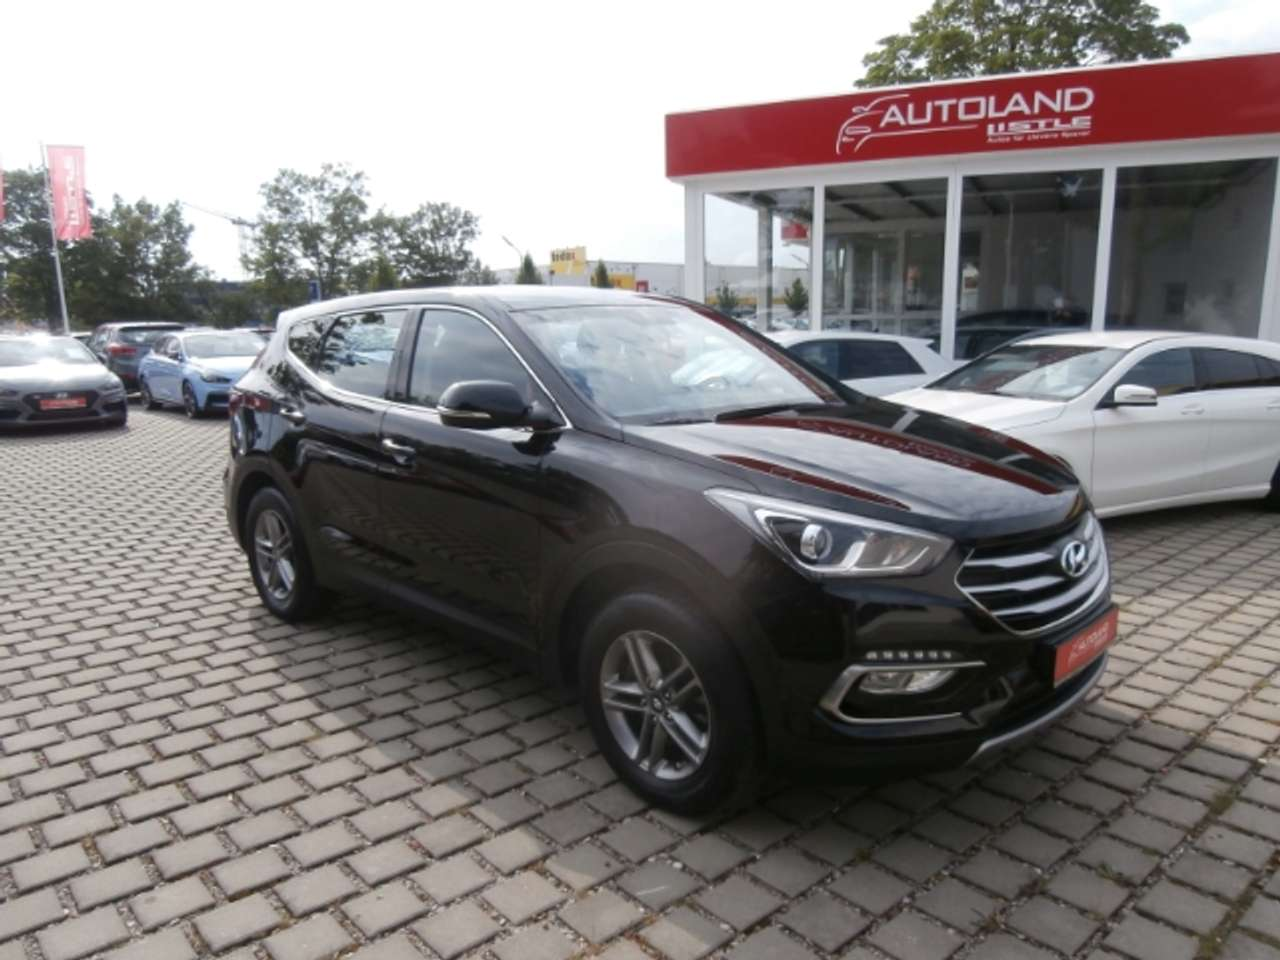 Autos nach Hyundai Santa Fé Santa Fe 2.4 GDI 2WD